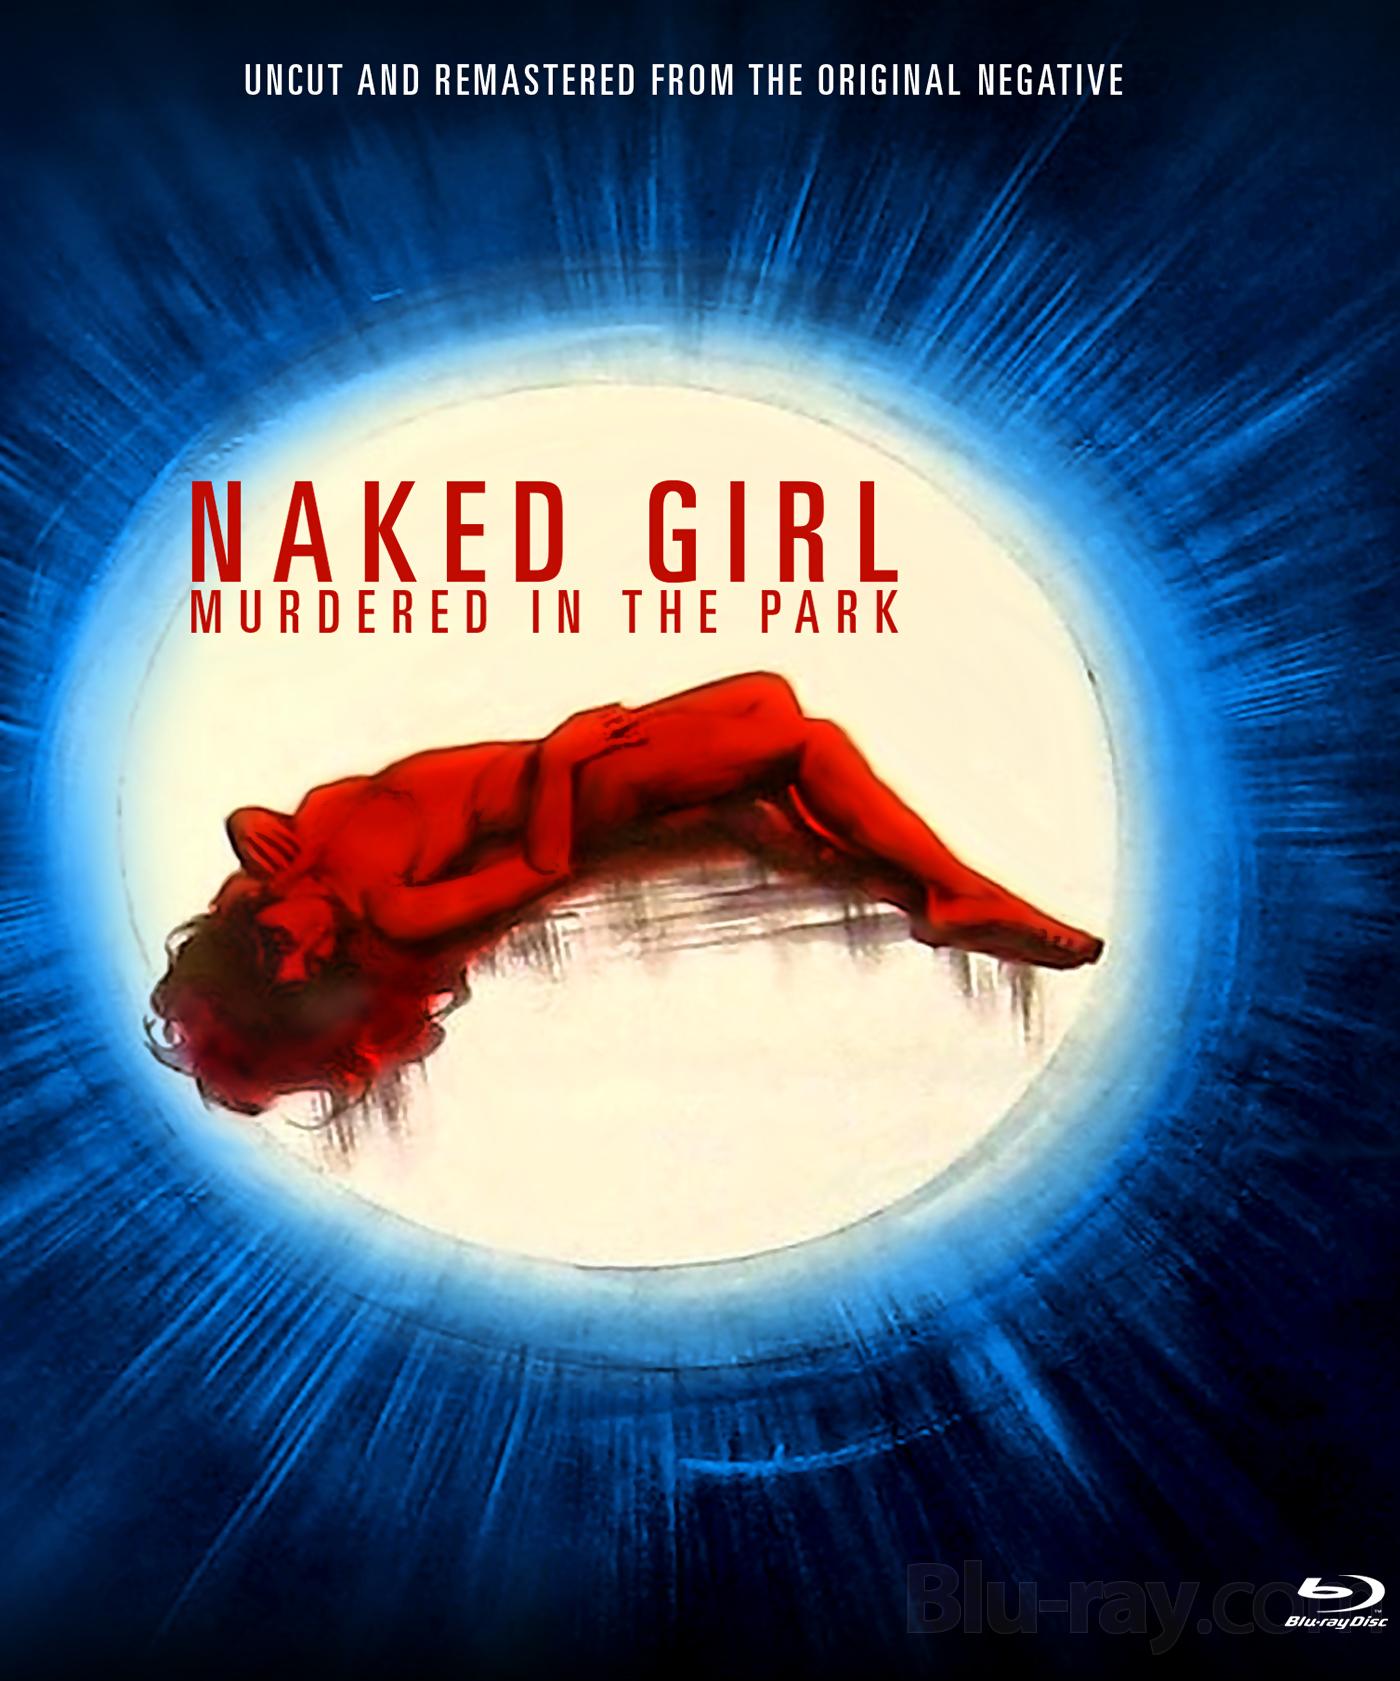 Naked teen news - Real Naked Girls